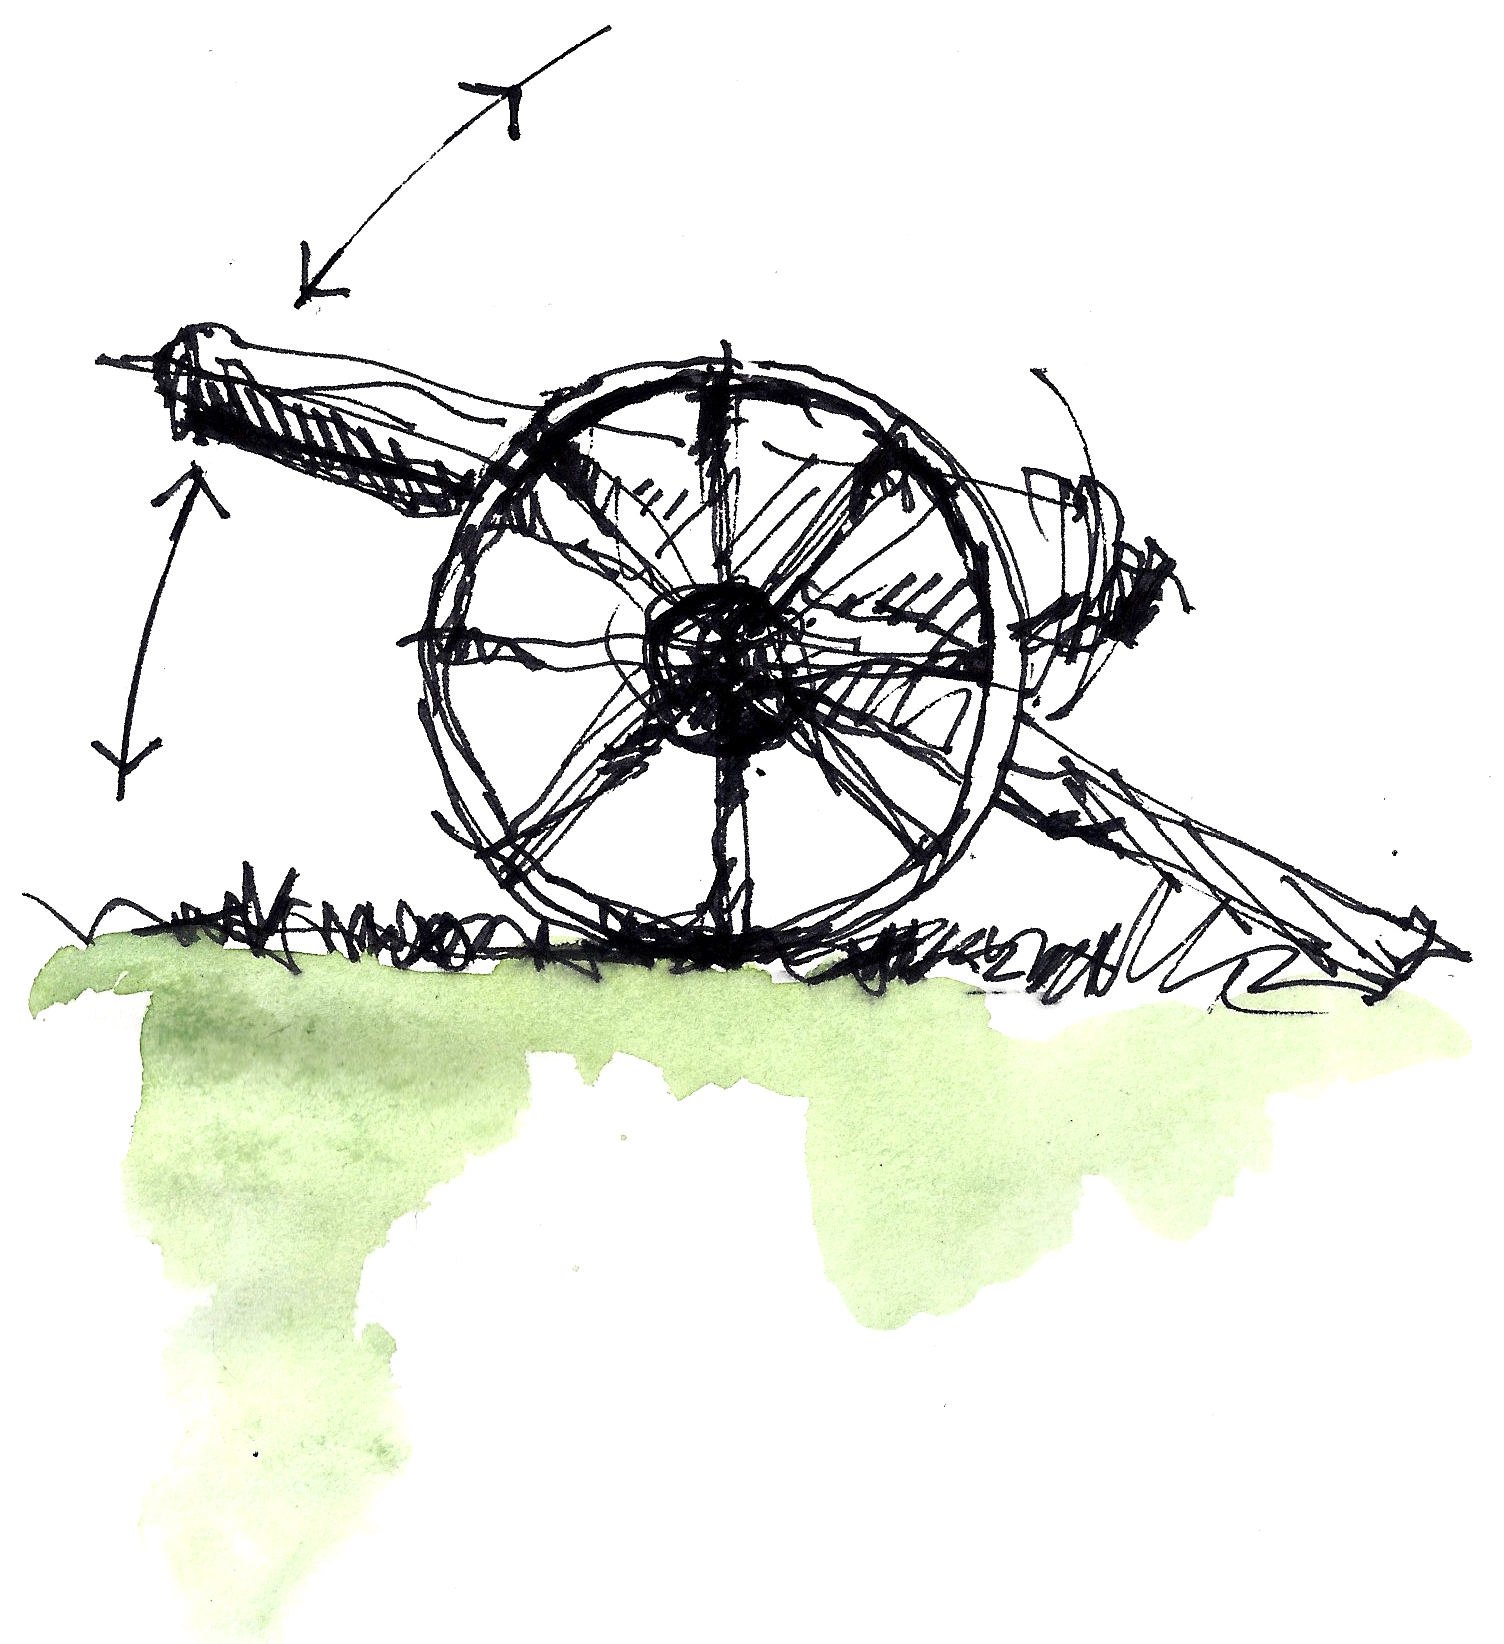 tbc-sketch_artillery.jpg